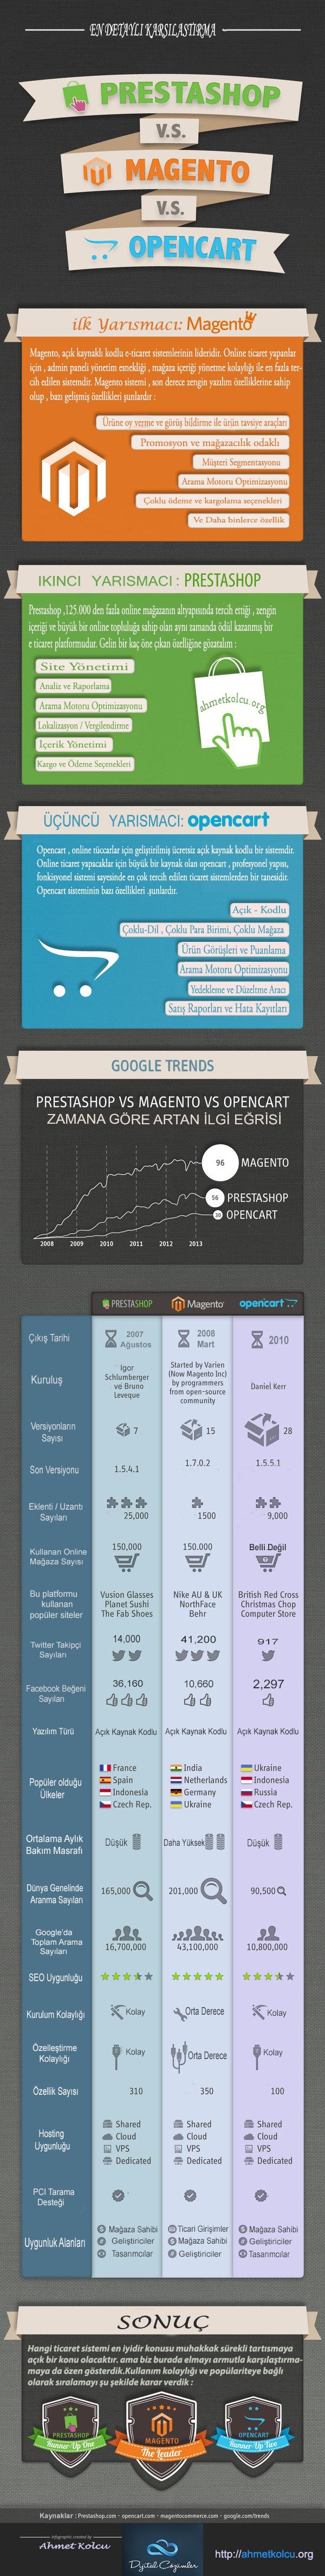 Opencart-Prestashop-Magento-en-iyi-ticaret-sistemi-hangisi